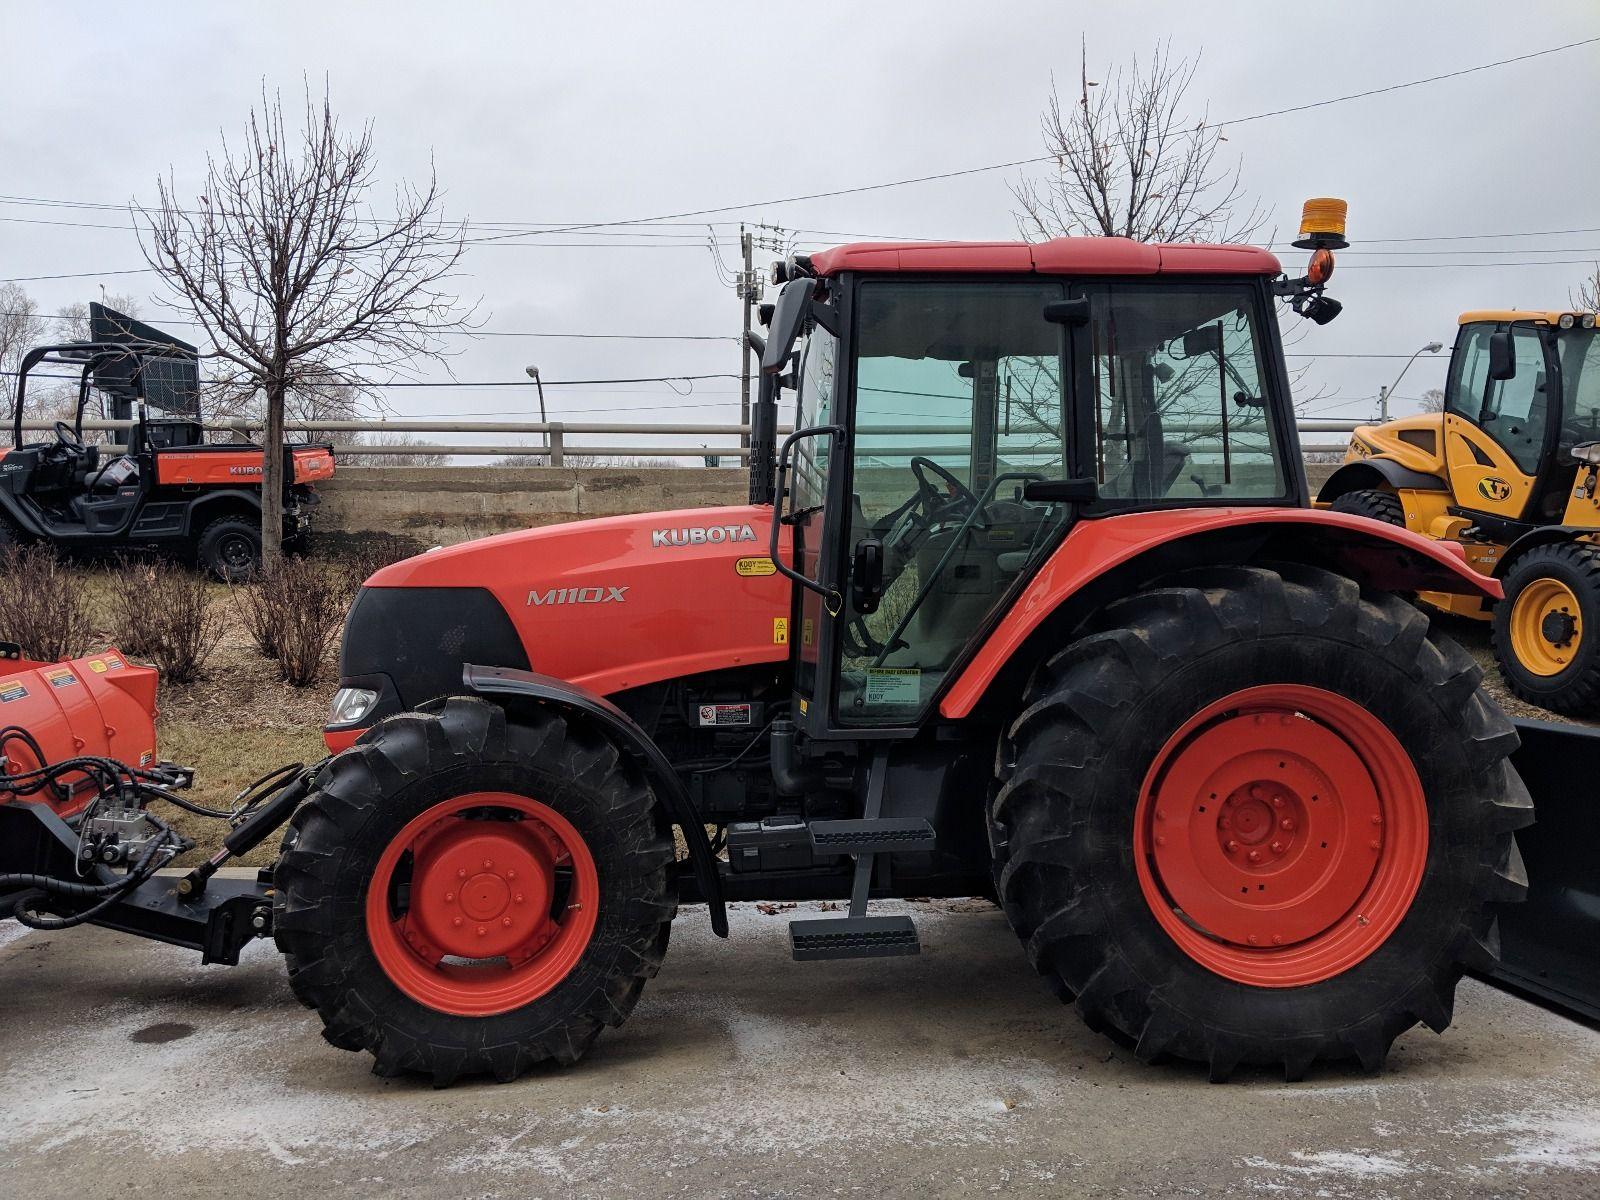 M110XDTC Kubota Tractor